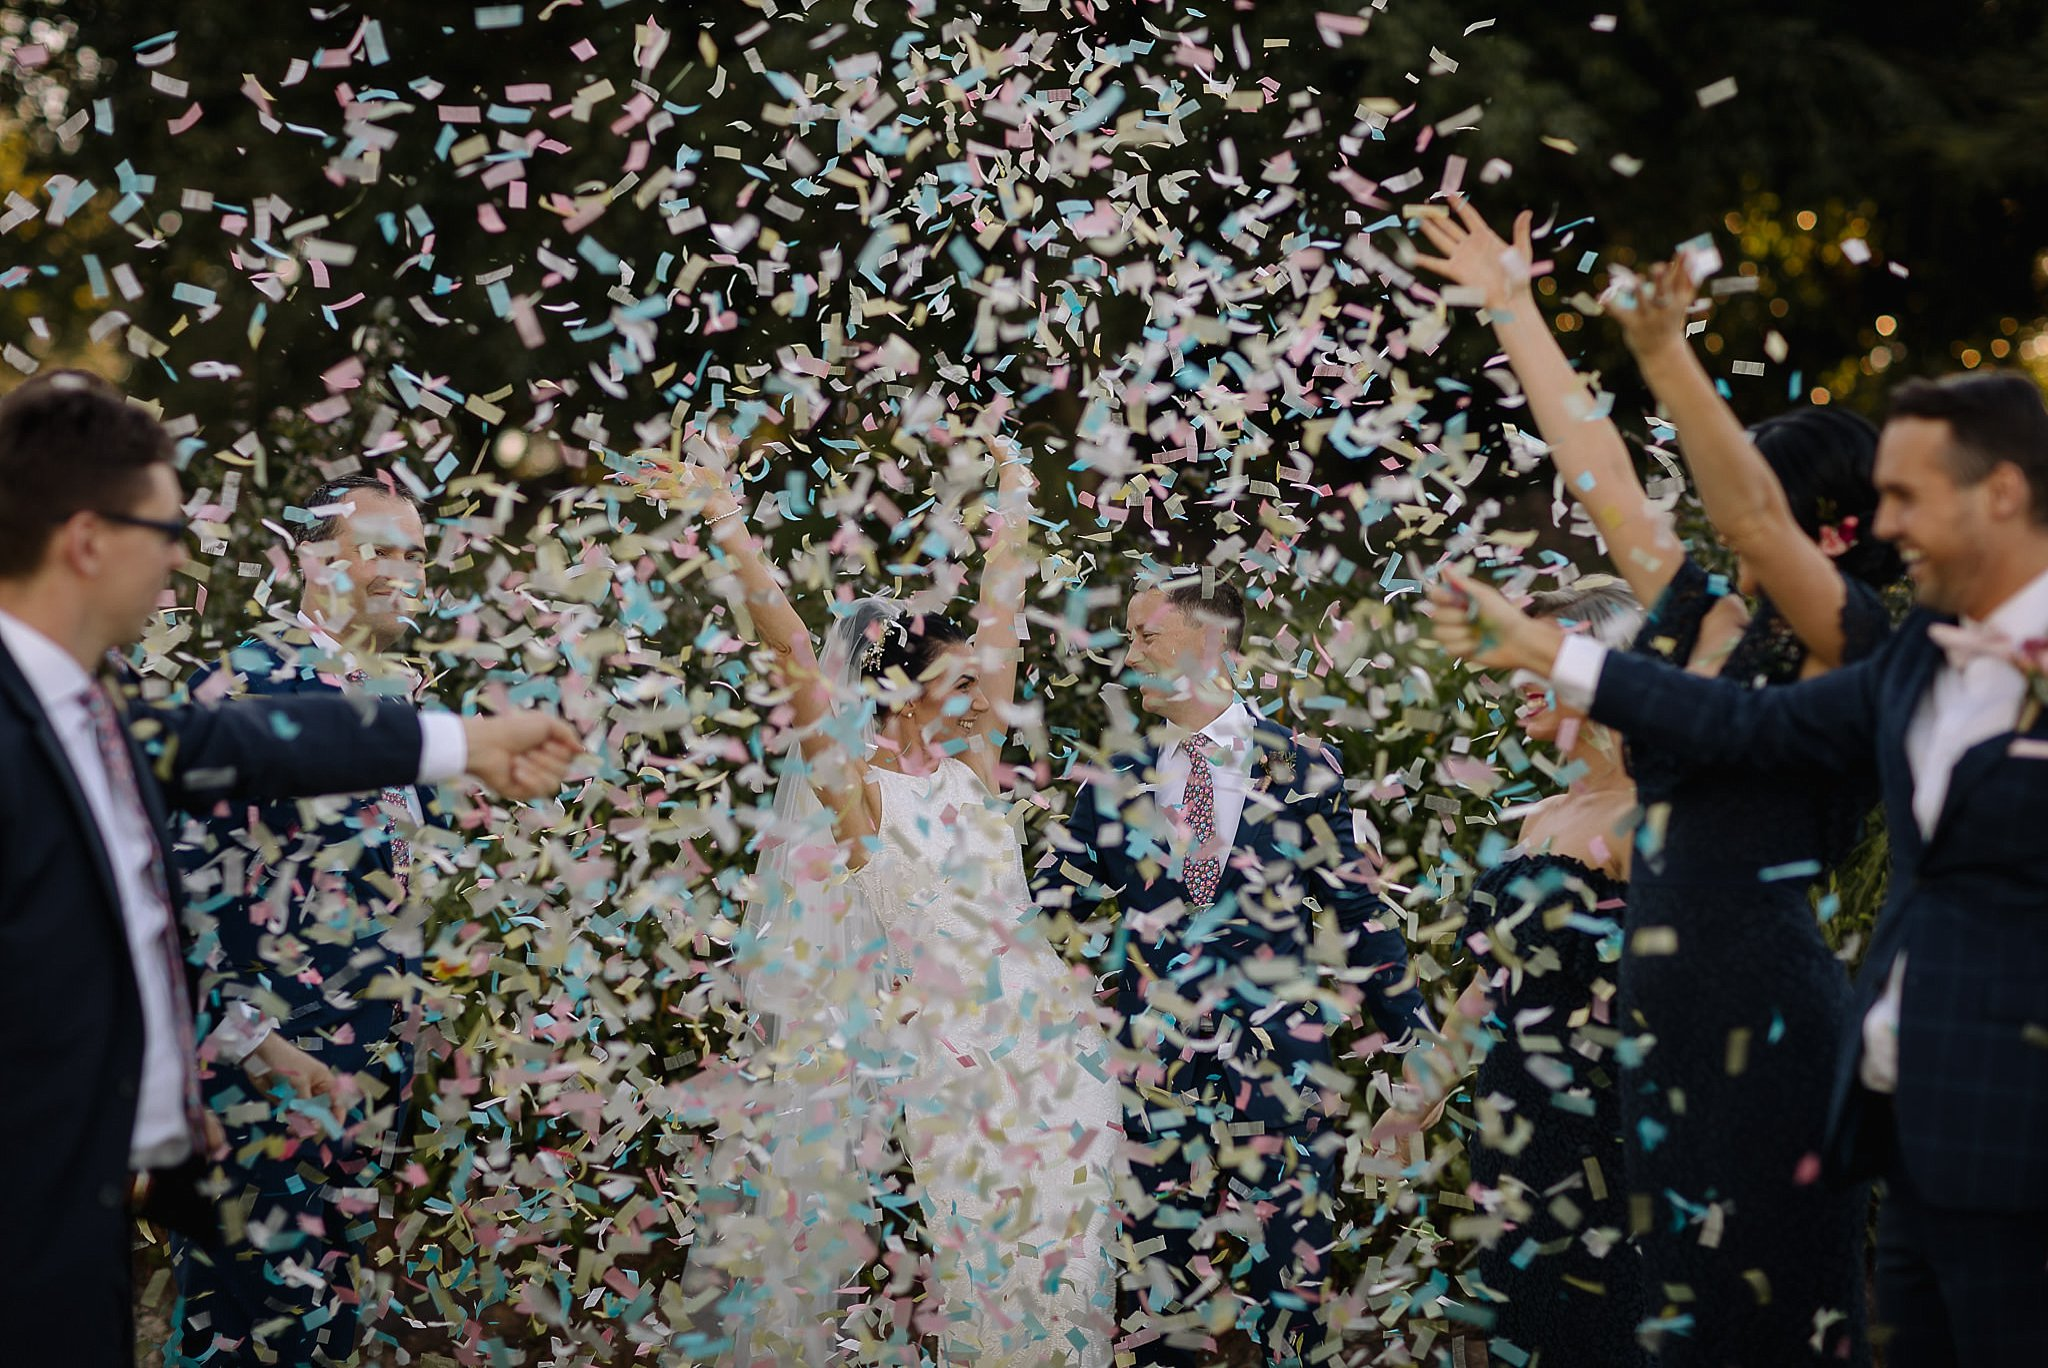 Keepsakephoto by the Keeffes,ACT wedding photographer,destination wedding photography,destination wedding,Summergrove Estate,Summergrove estate wedding,Gold Coast wedding,Gold Coast wedding photographer,Canberra Wedding Photography,autumn wedding,Barn Wedding,